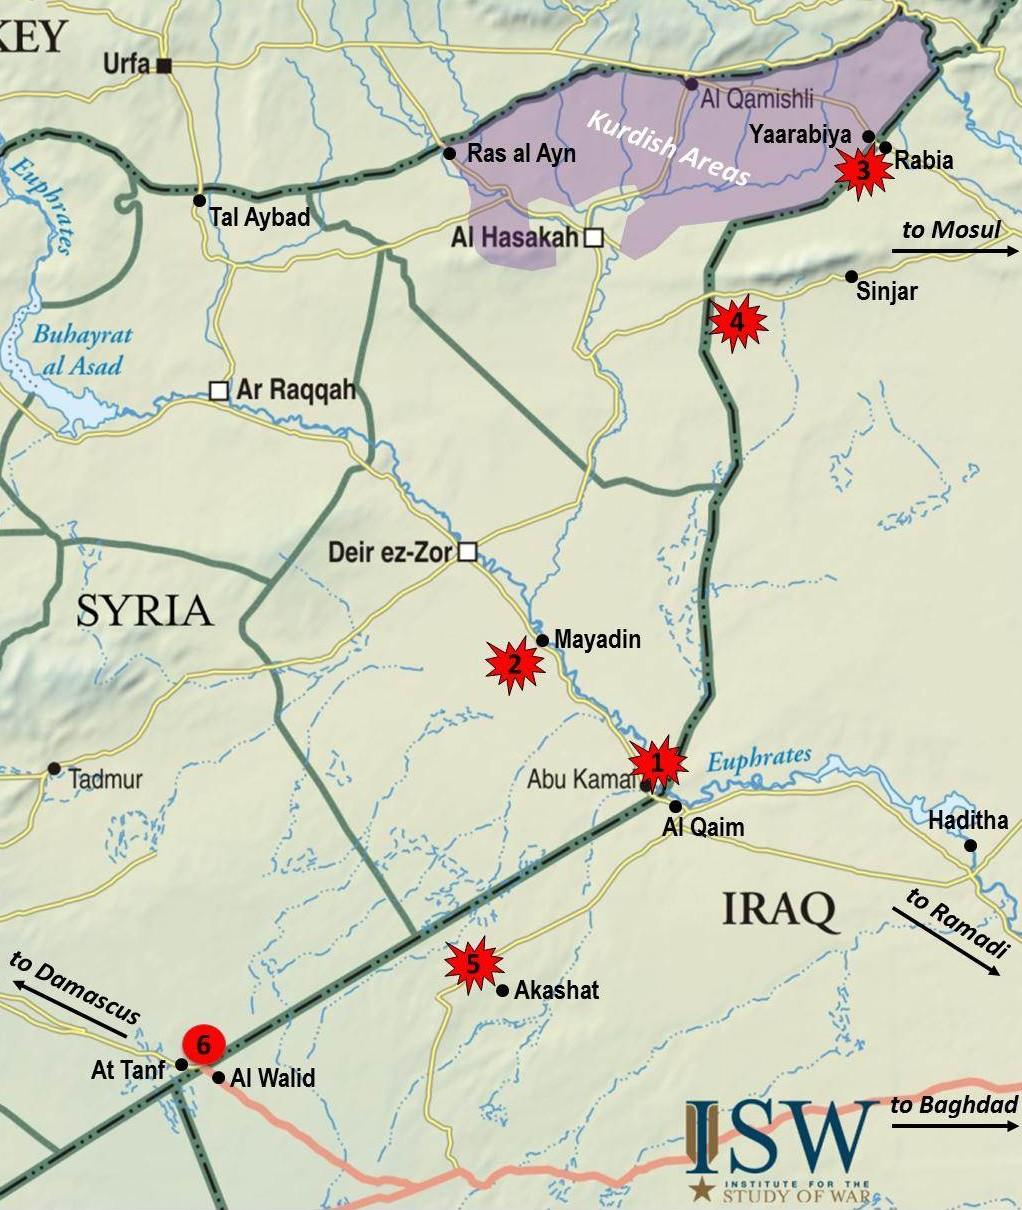 EKTAKTO – Eτοιμη η νέα δύναμη εισβολής του Ρ.Τ.Ερντογάν: 7.000 Τούρκοι στρατιώτες μαζί με FSA και τον ιδιωτικό στρατό SADAT μπαίνουν στην Συρία από τρία σημεία – Mετωπική με ΗΠΑ επέλεξε ο «Σουλτάνος» – Είναι αυτό το κύκνειο άσμα του; (εικόνες, βίντεο) - Εικόνα1